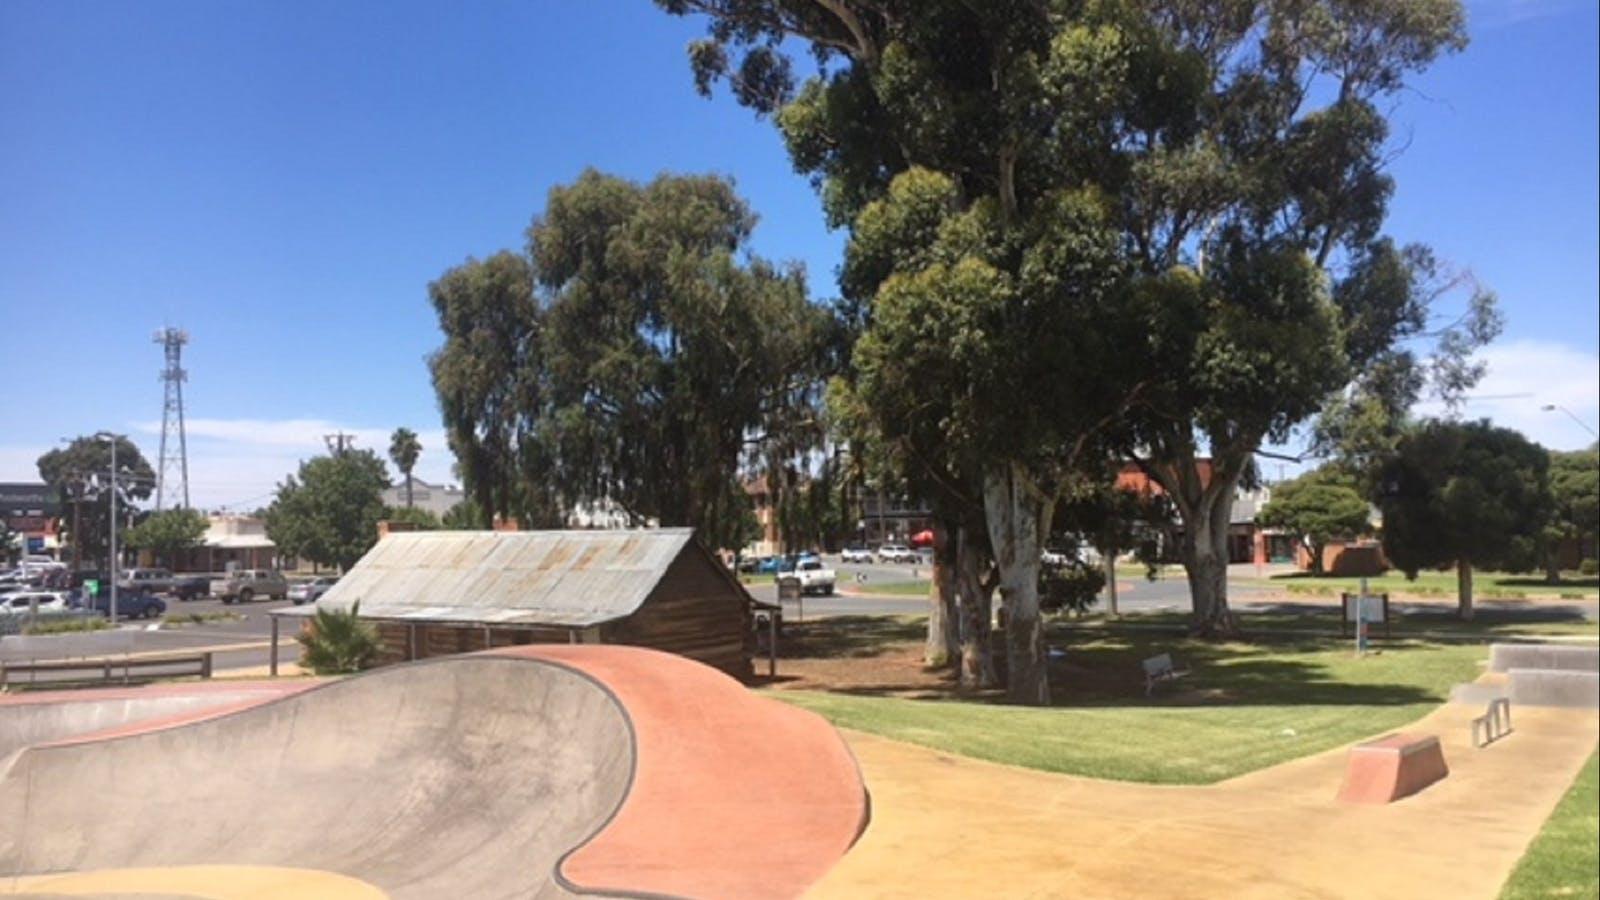 Cobram Skate Park